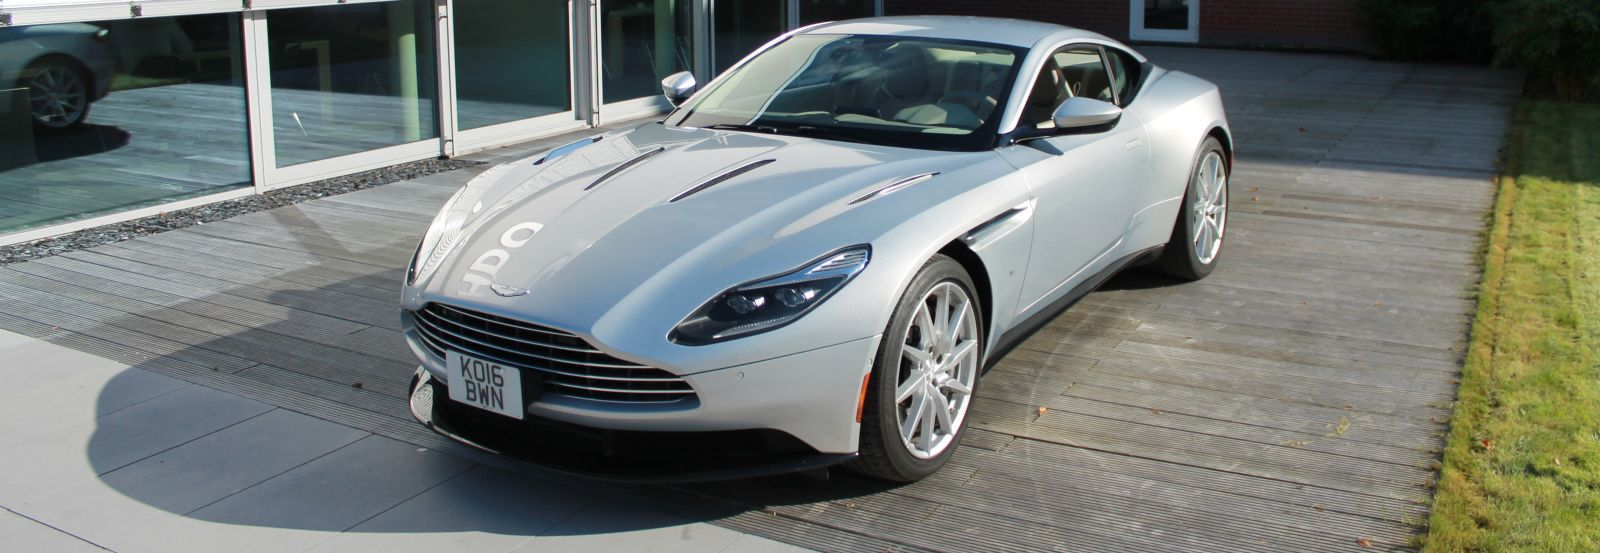 Decorative element exterior on a silver Aston Martin